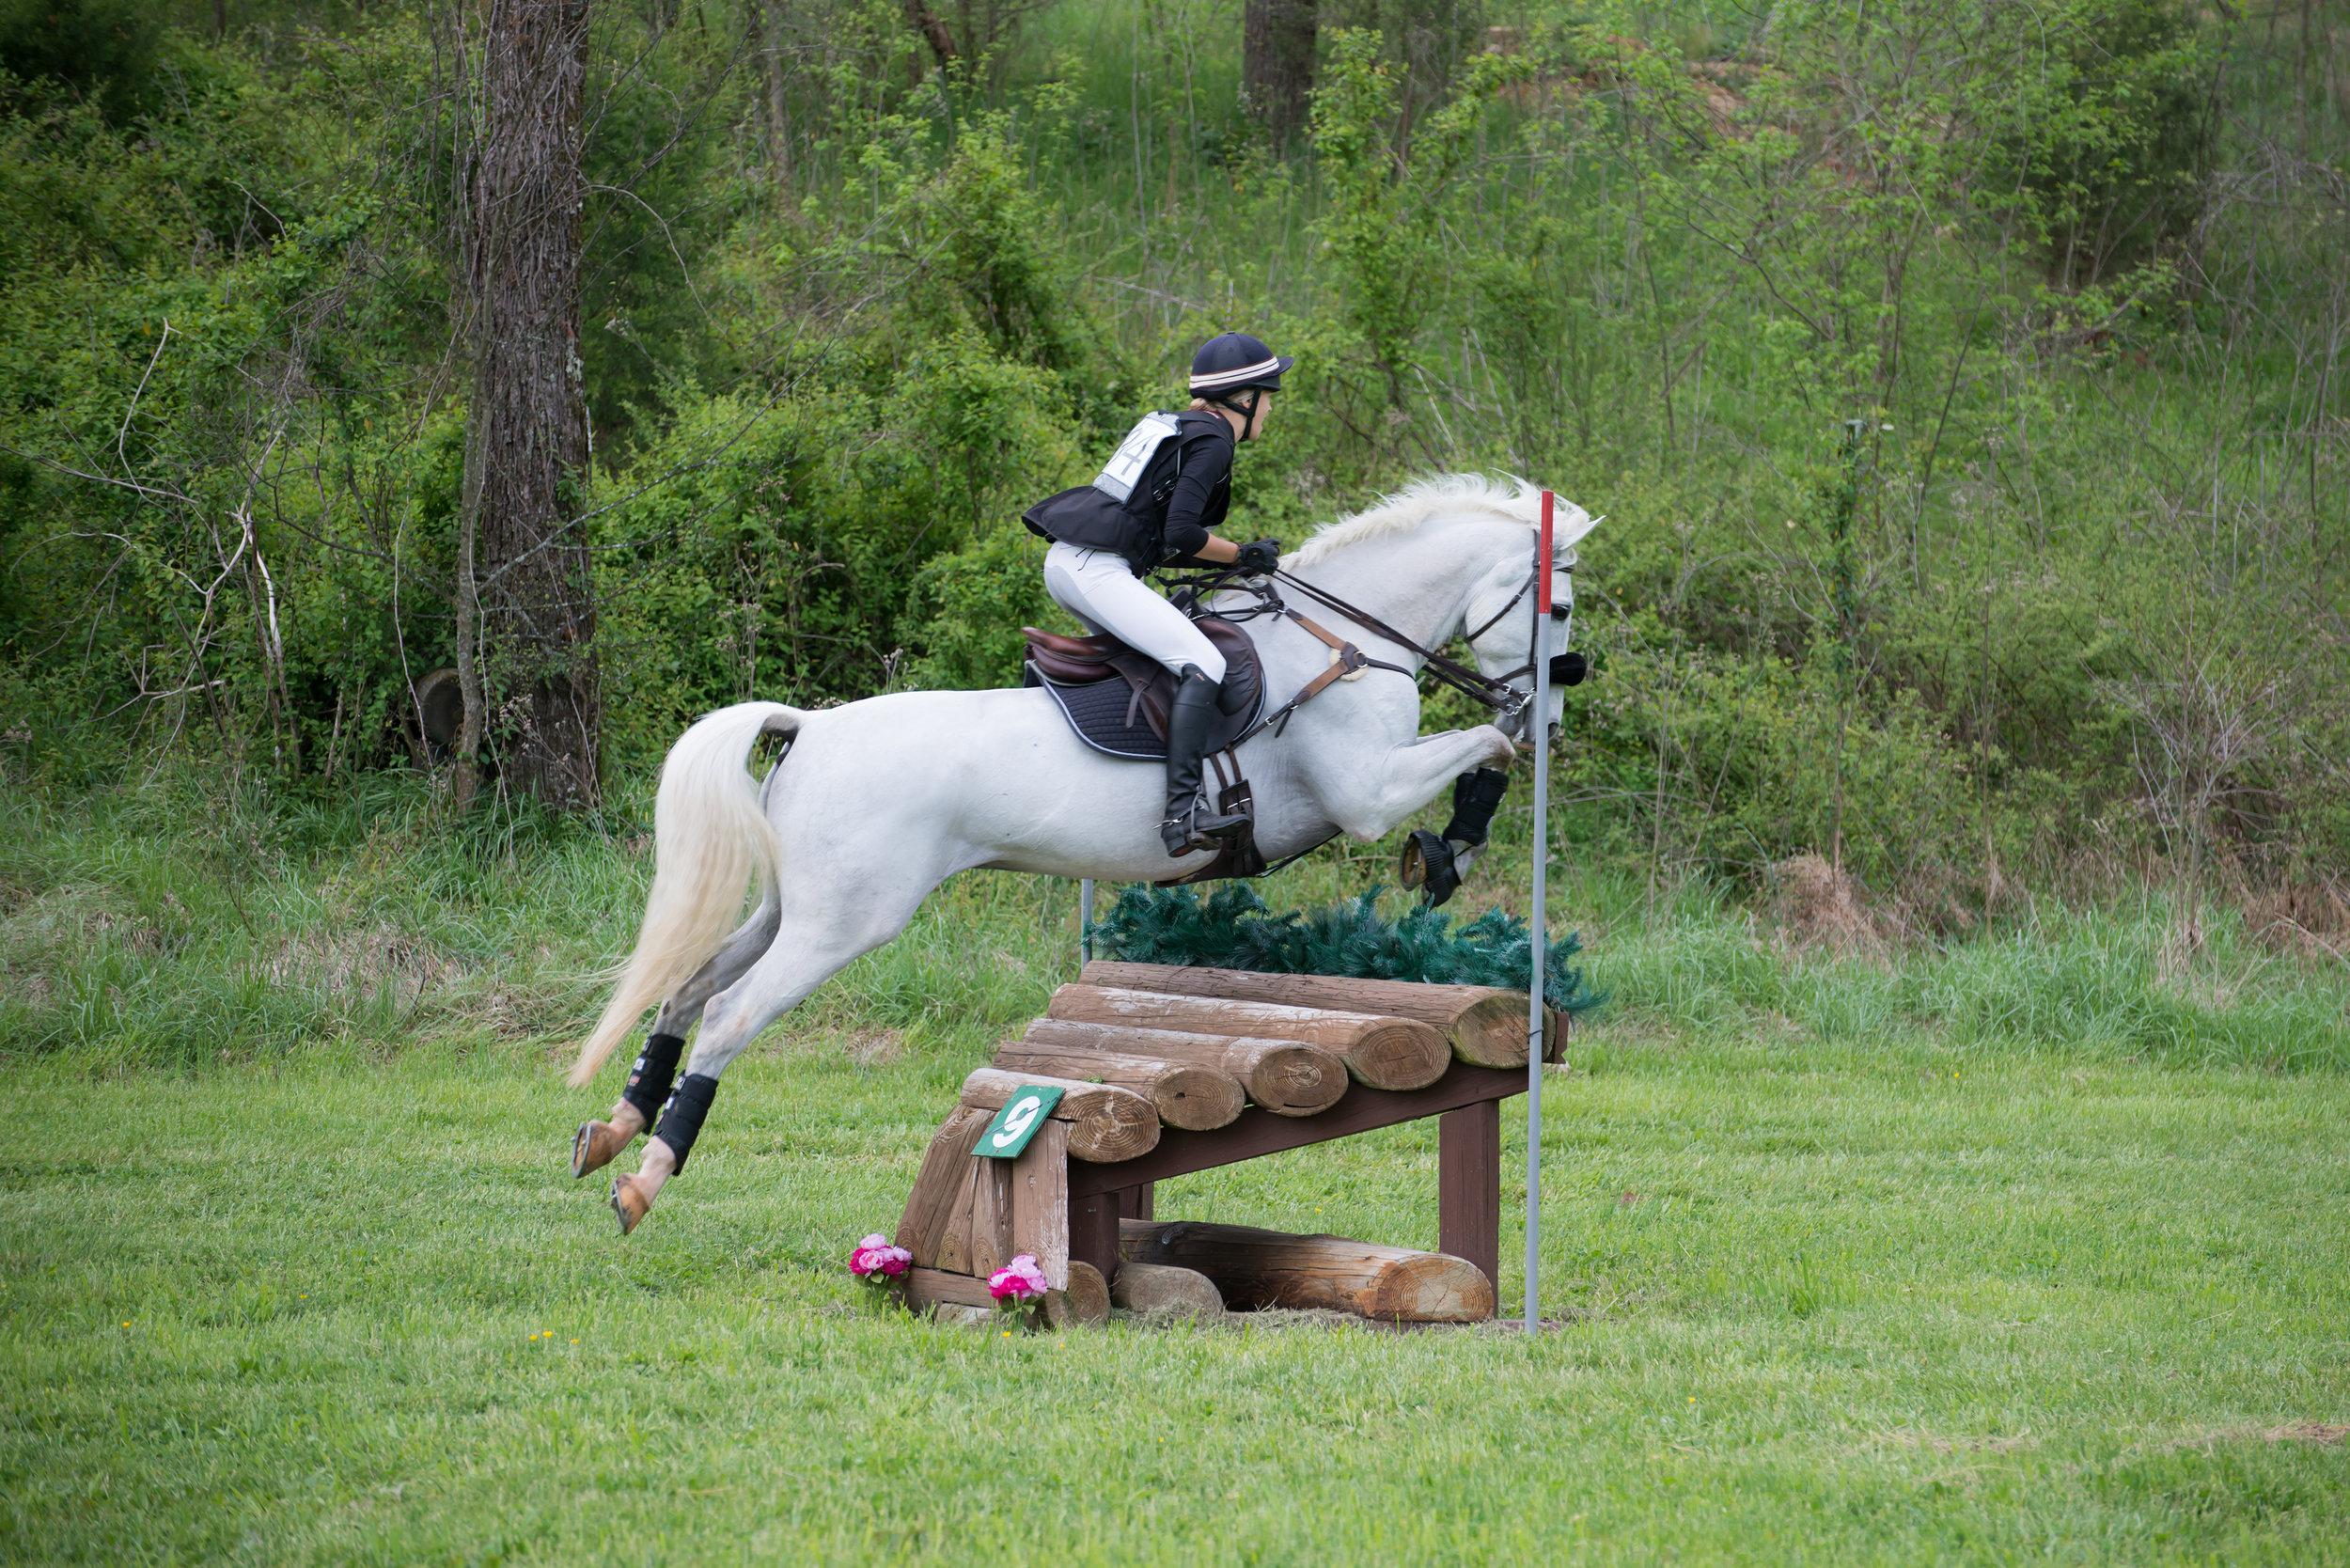 Hidden_Gem_horse_trials_trainer_eventing_3_day_usea_prelim_05.jpg